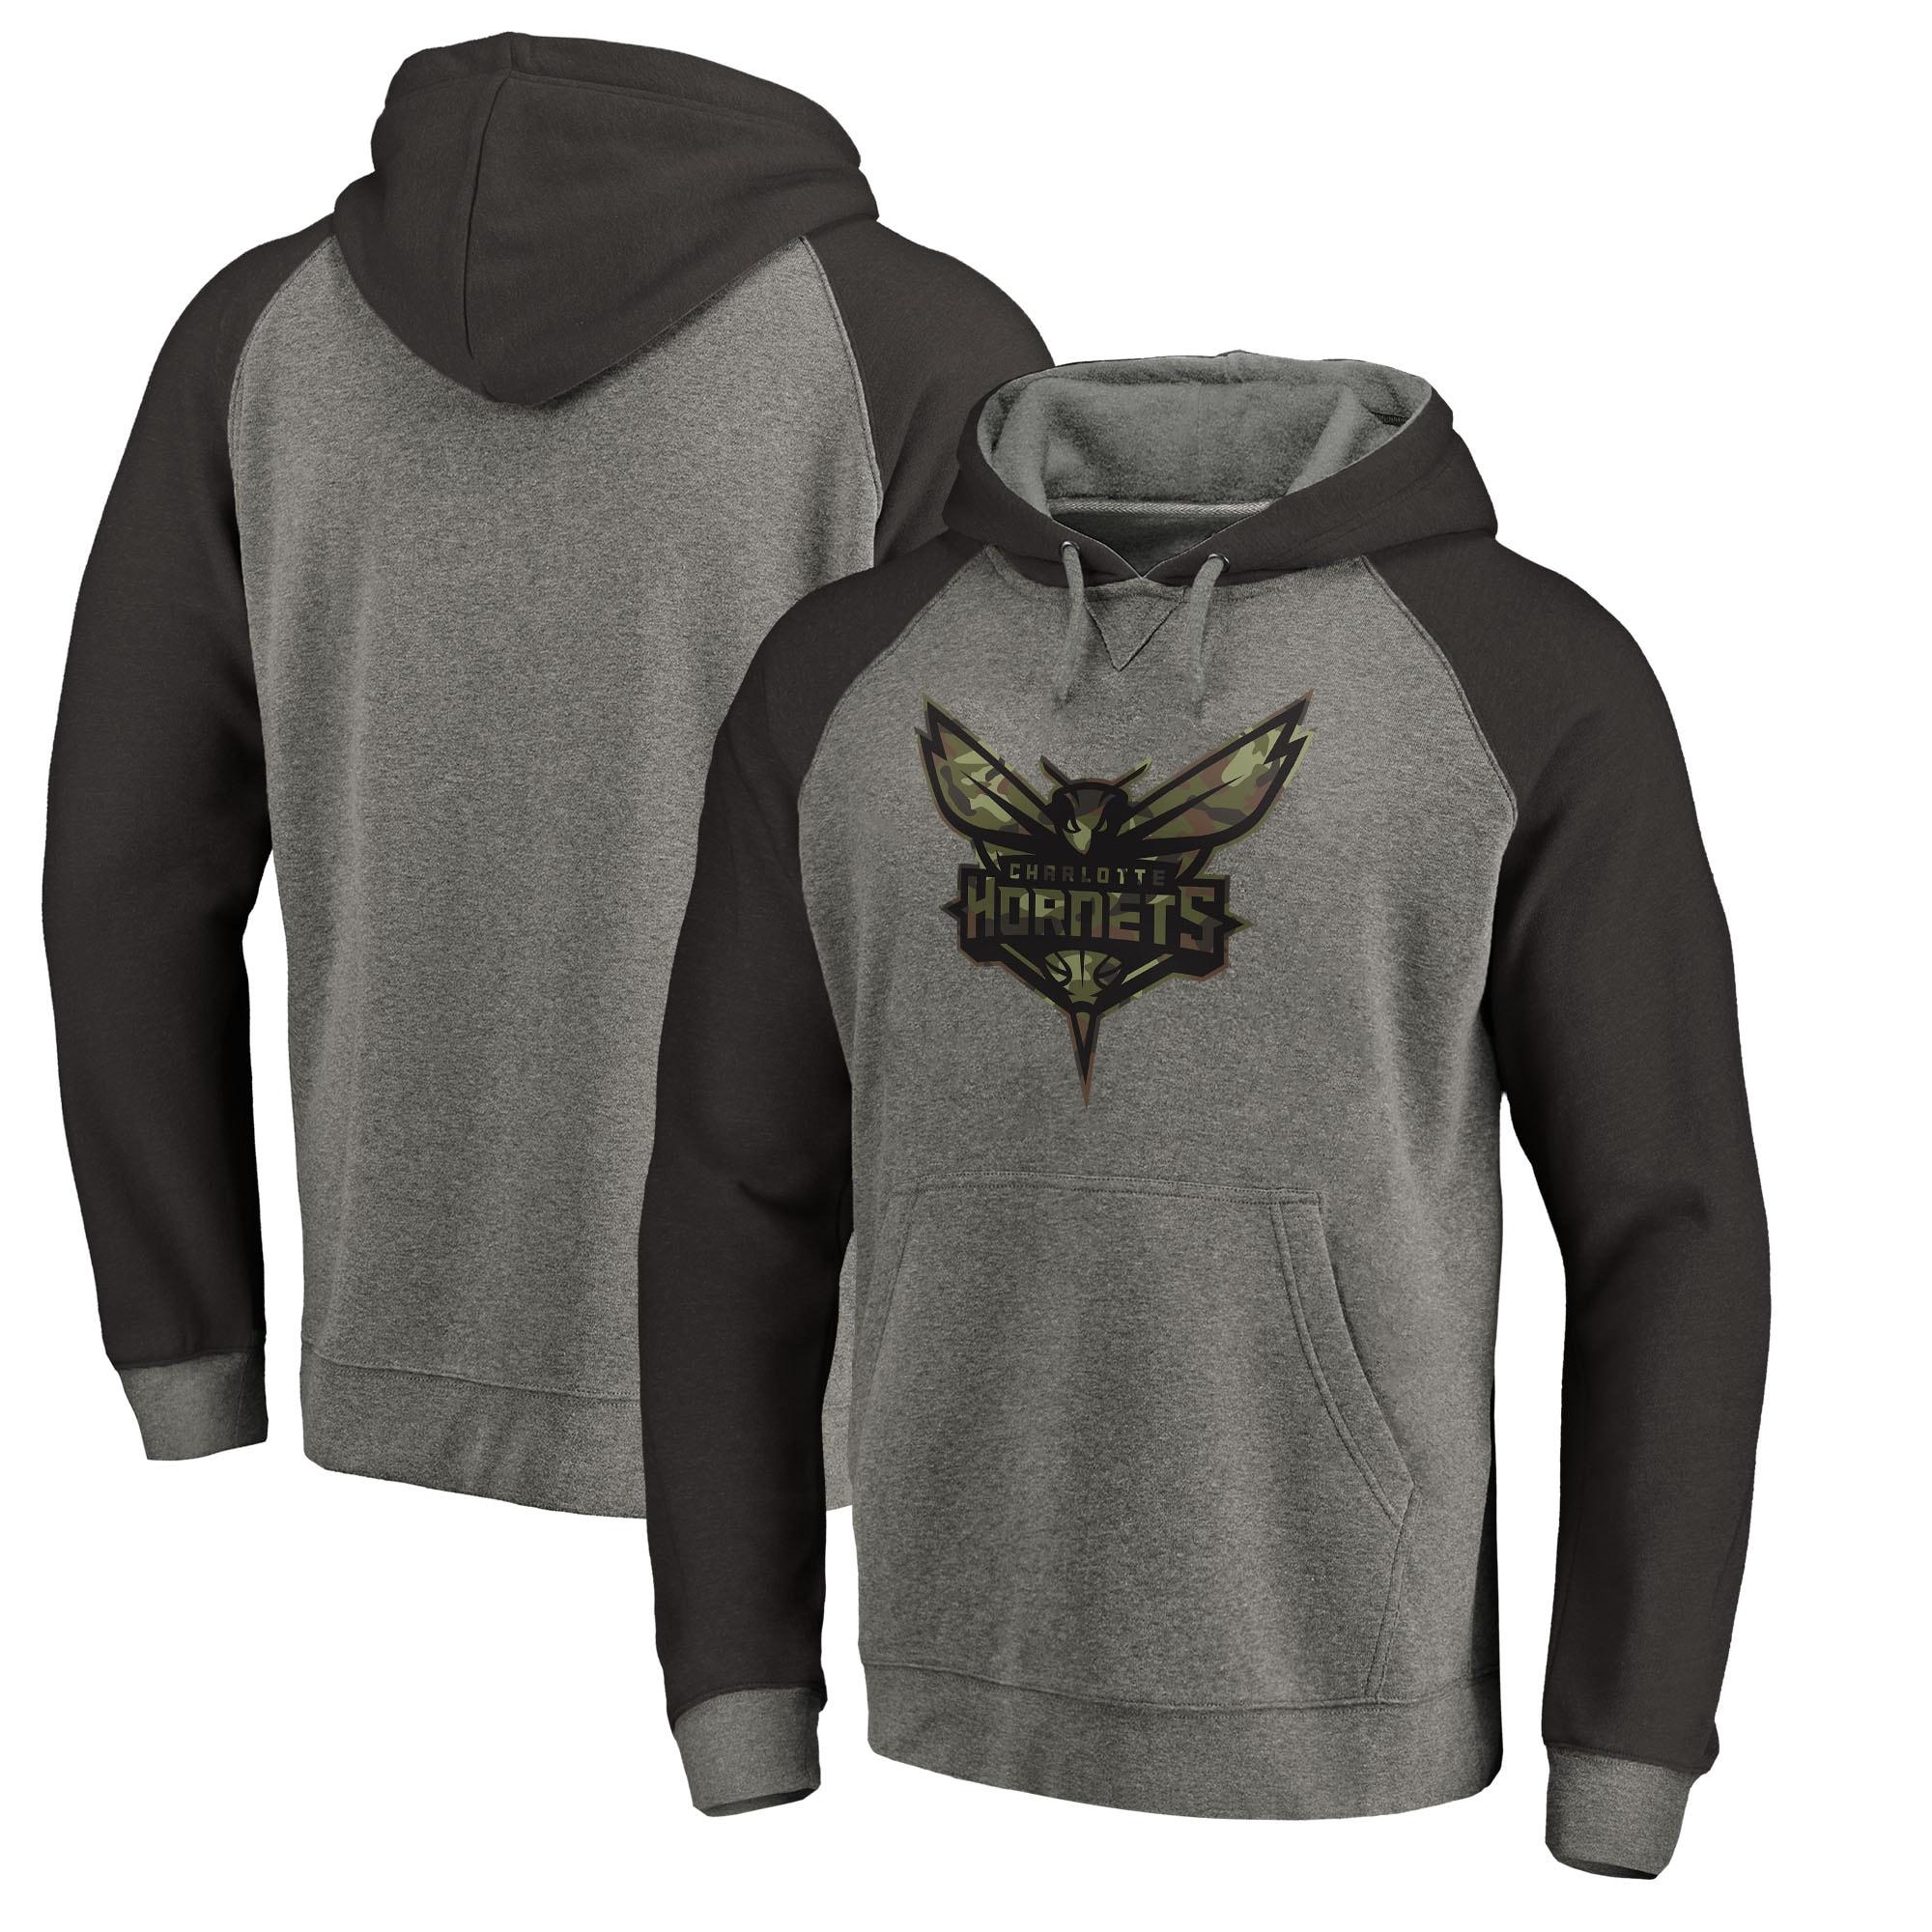 Charlotte Hornets Fanatics Branded Prestige Camo Tri-Blend Pullover Hoodie - Heathered Gray